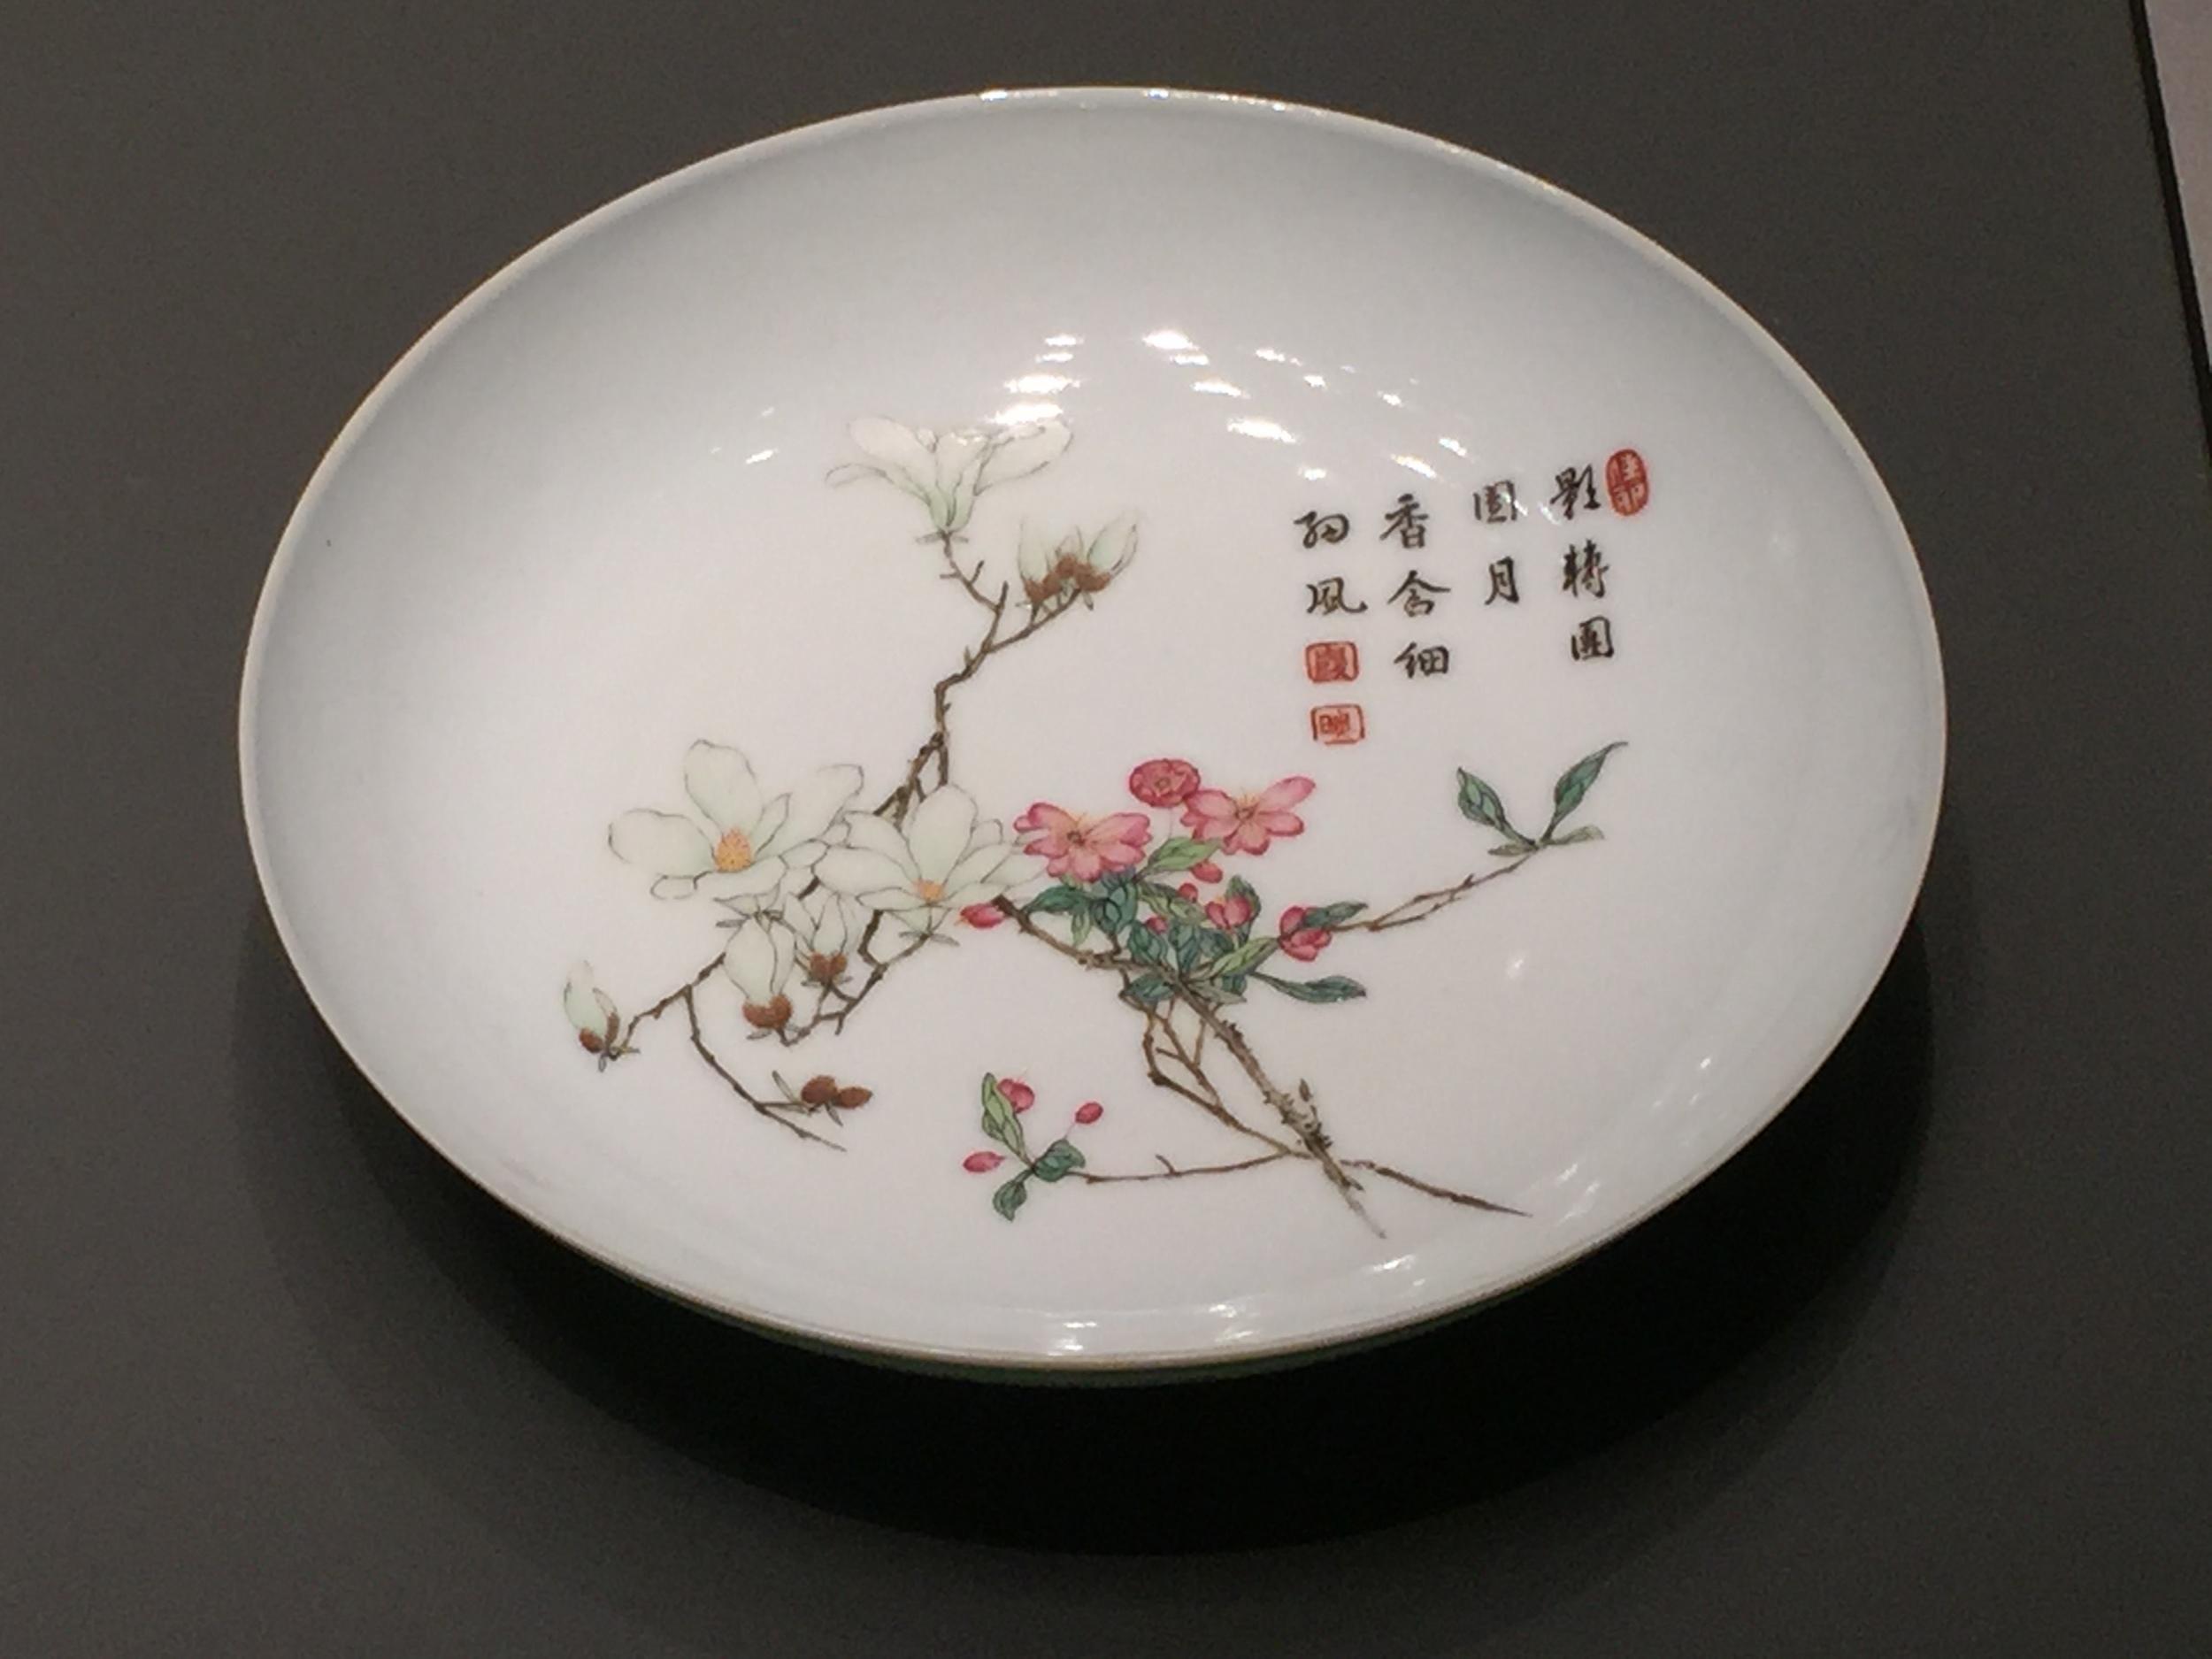 Chinese-Porcelain-British-Museum-Percival-David-jessewaugh.com-145.jpg